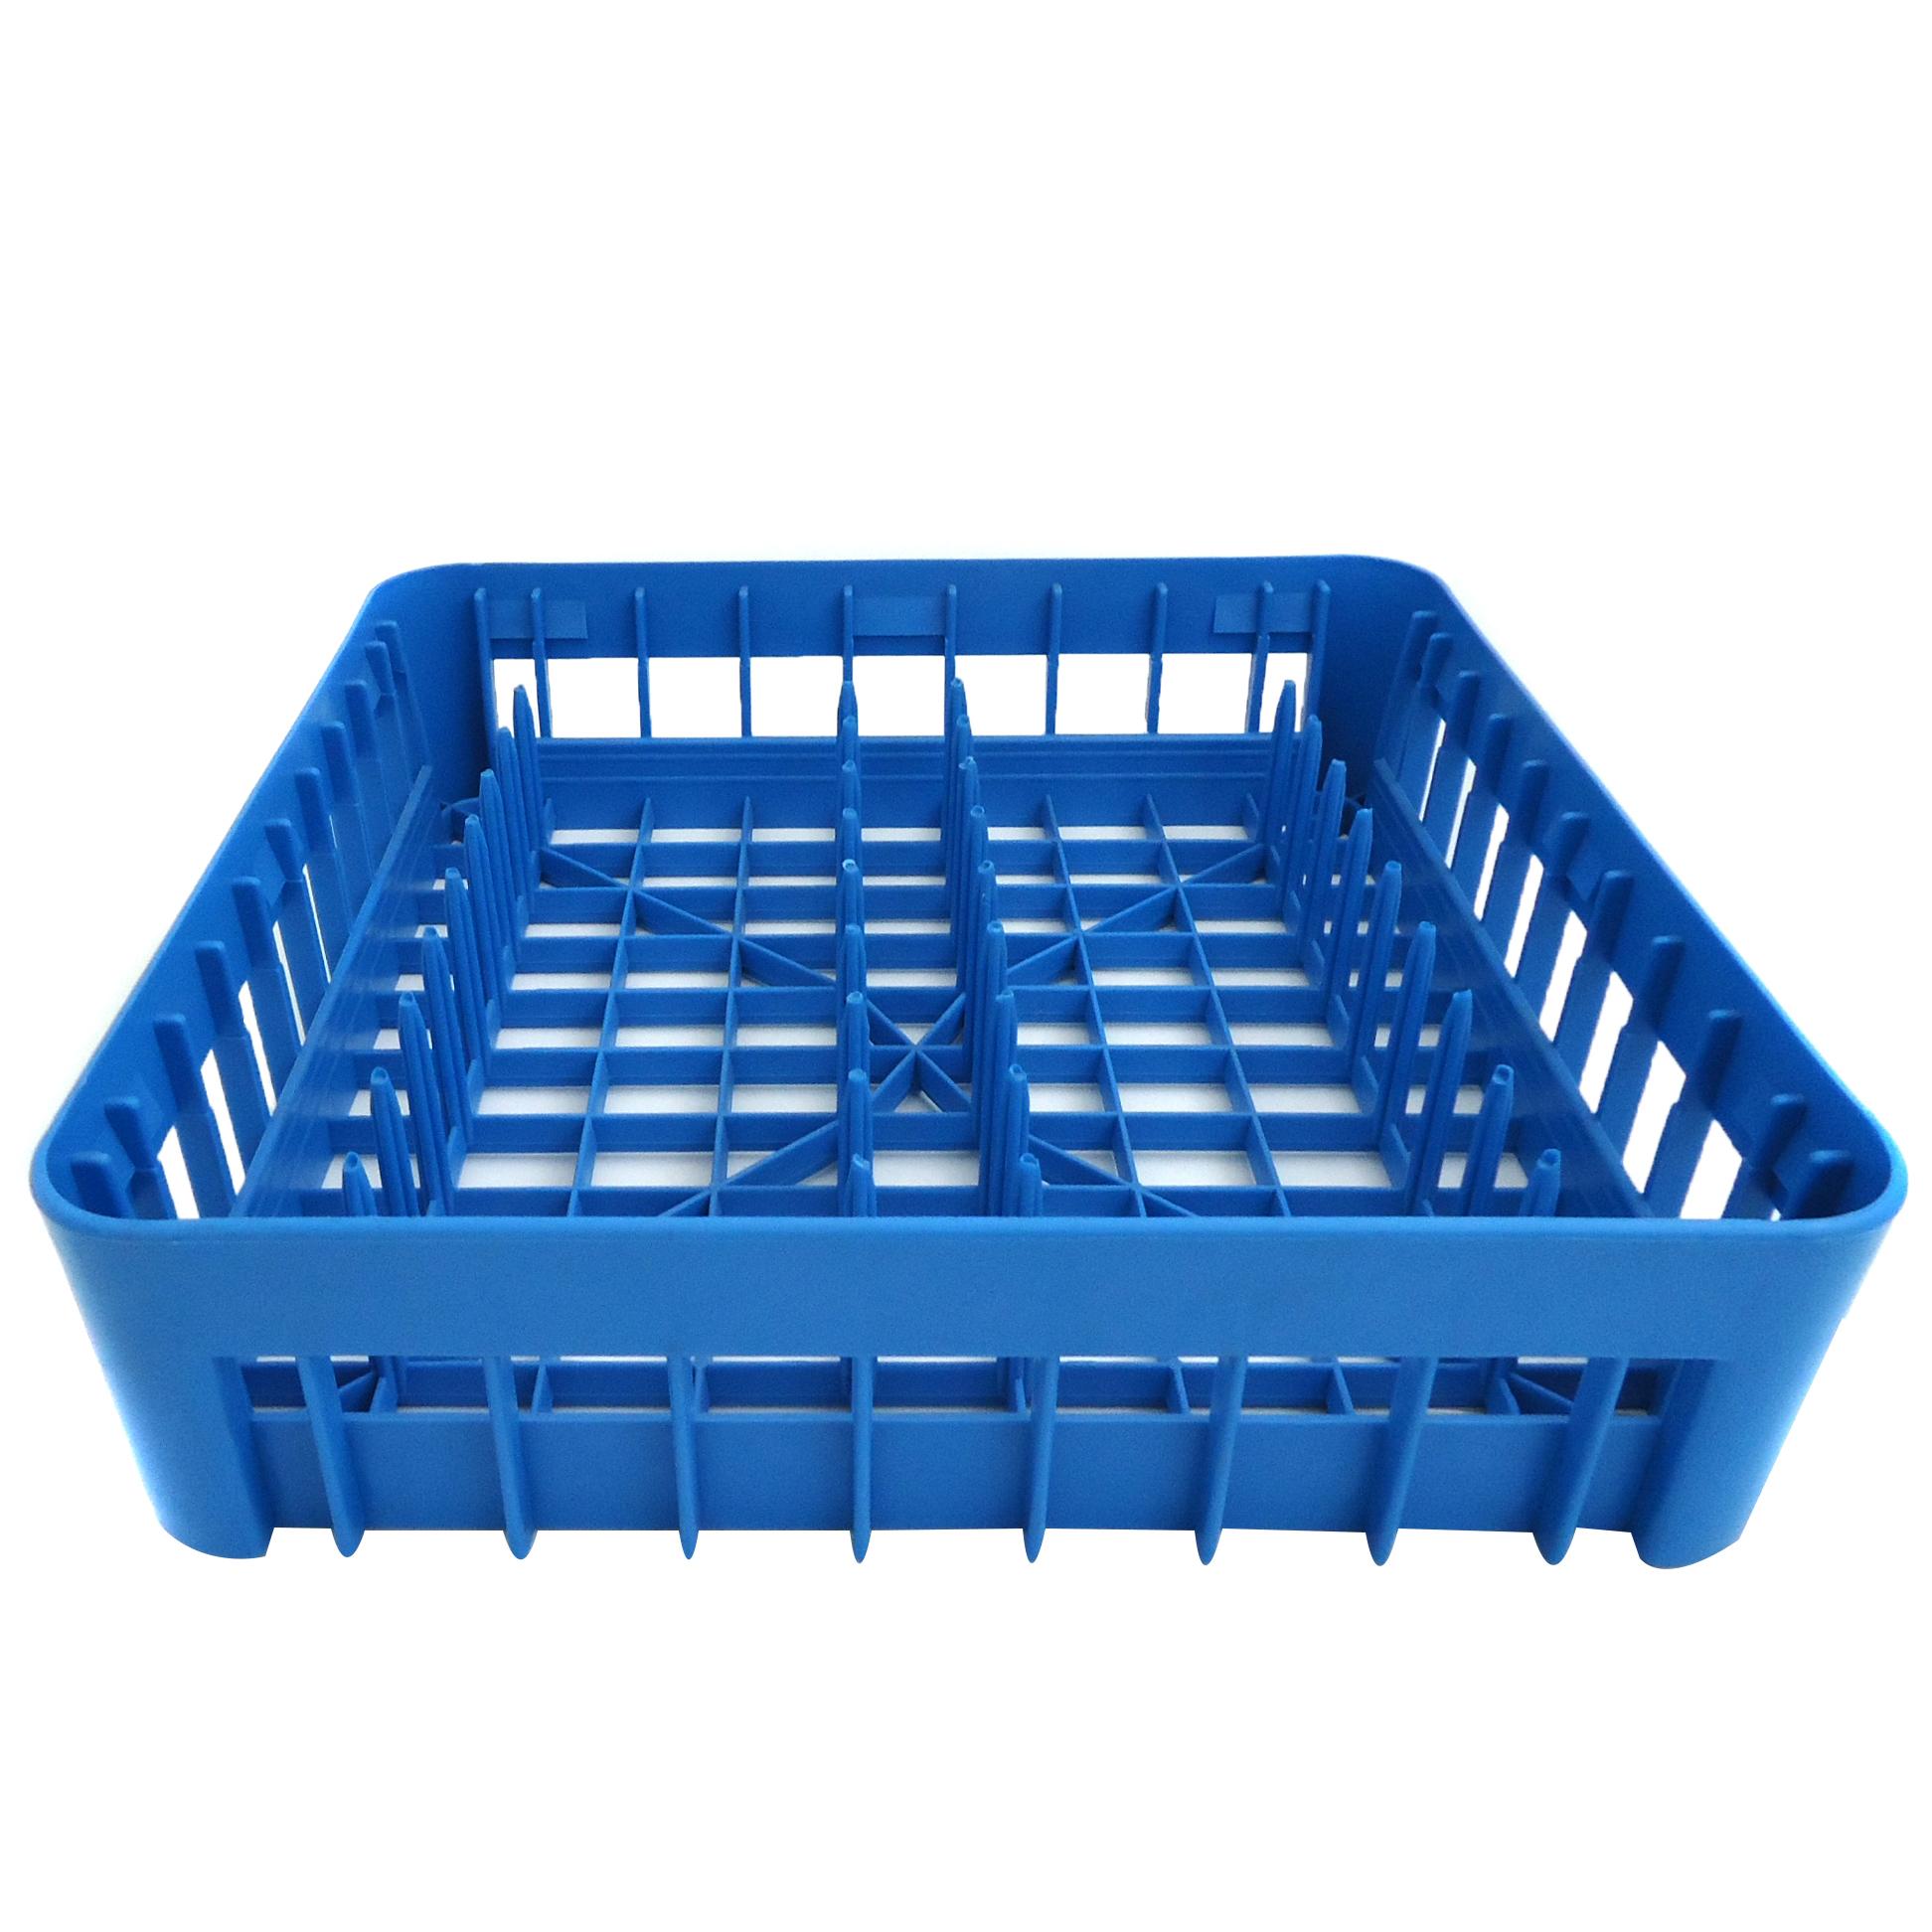 Lacor 69241 Καλάθι Πλυντηρίου Πιάτων - 400x400x110mm επαγγελματικός εξοπλισμός   καλάθια πλυντηρίων  επαγγελματικός εξοπλισμός   πλυν